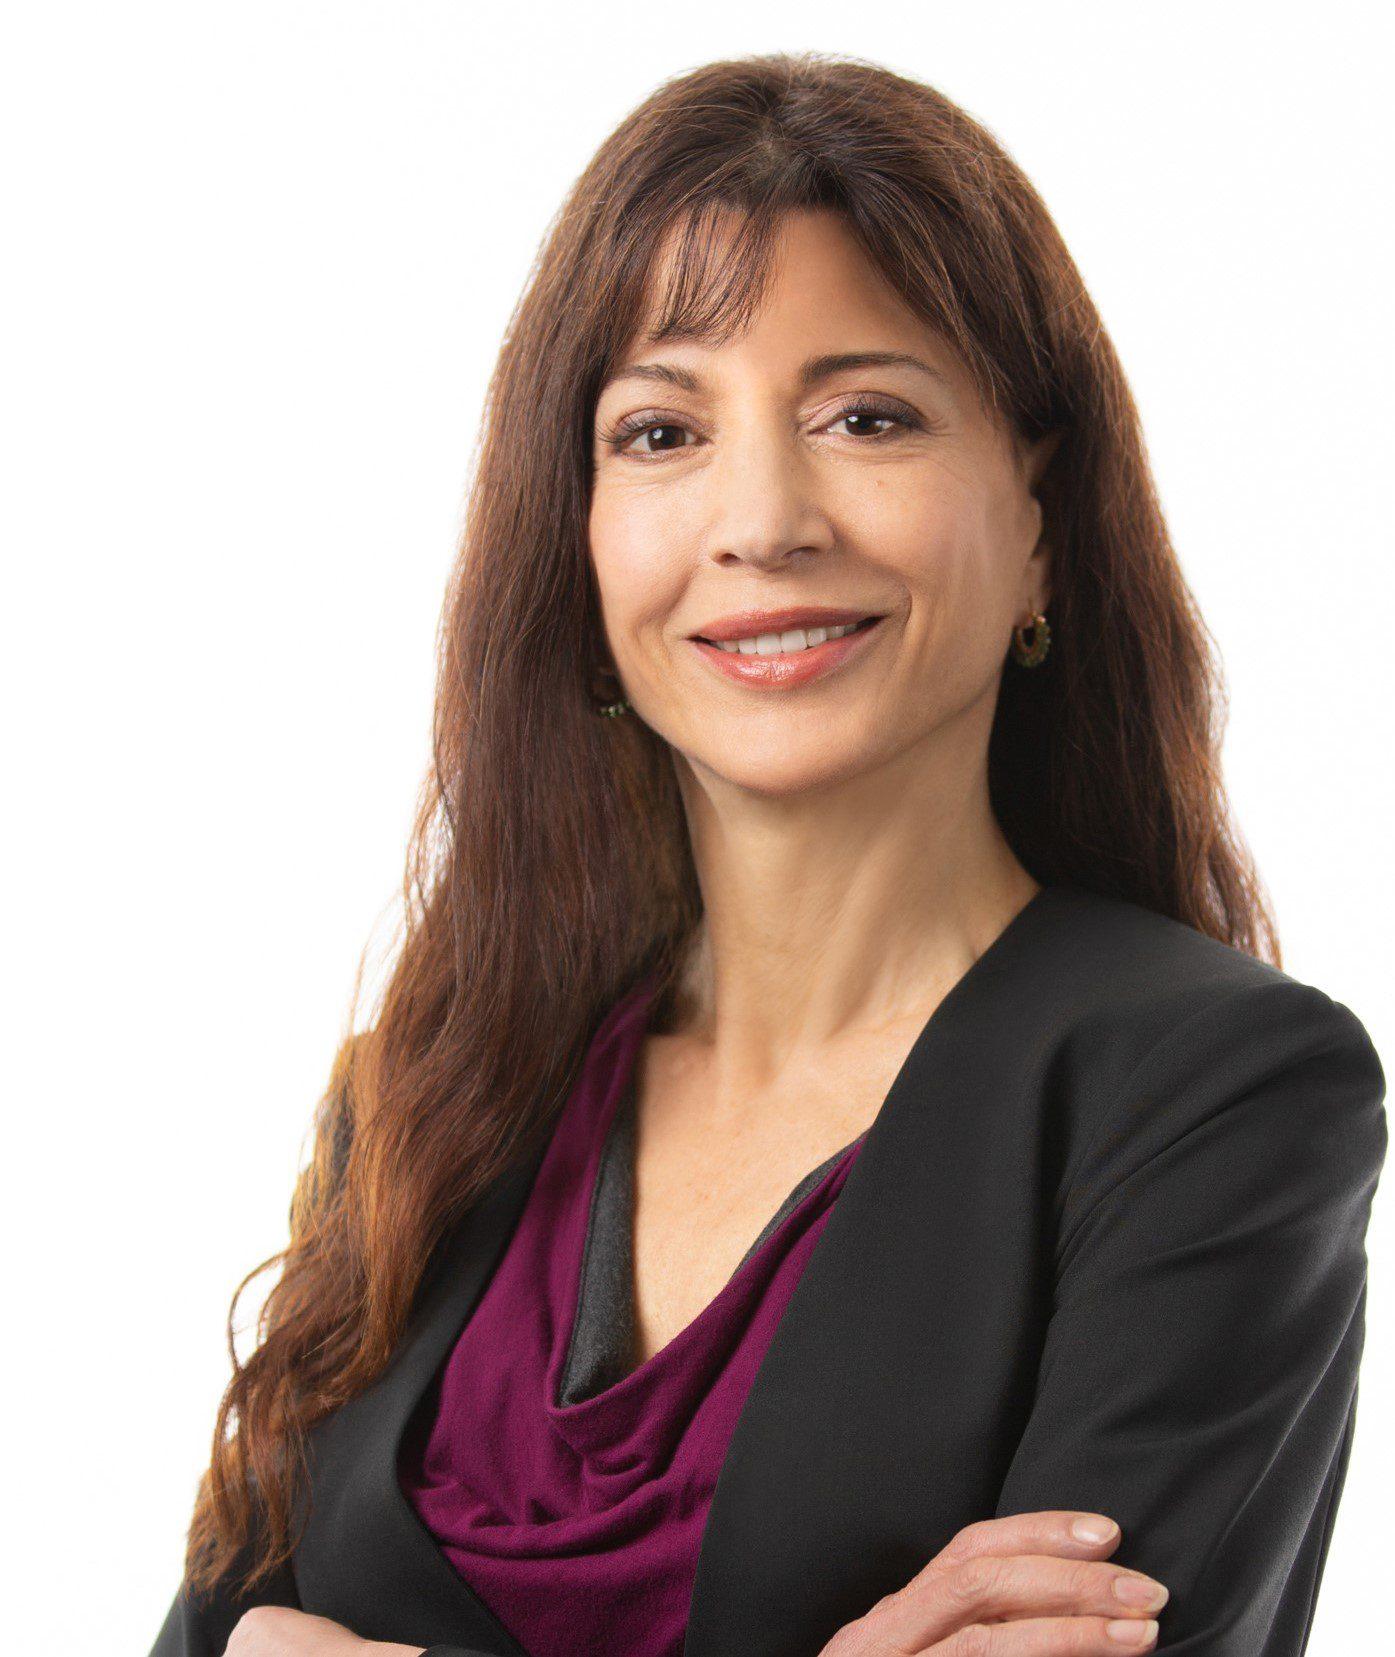 Elizabeth Borrelli